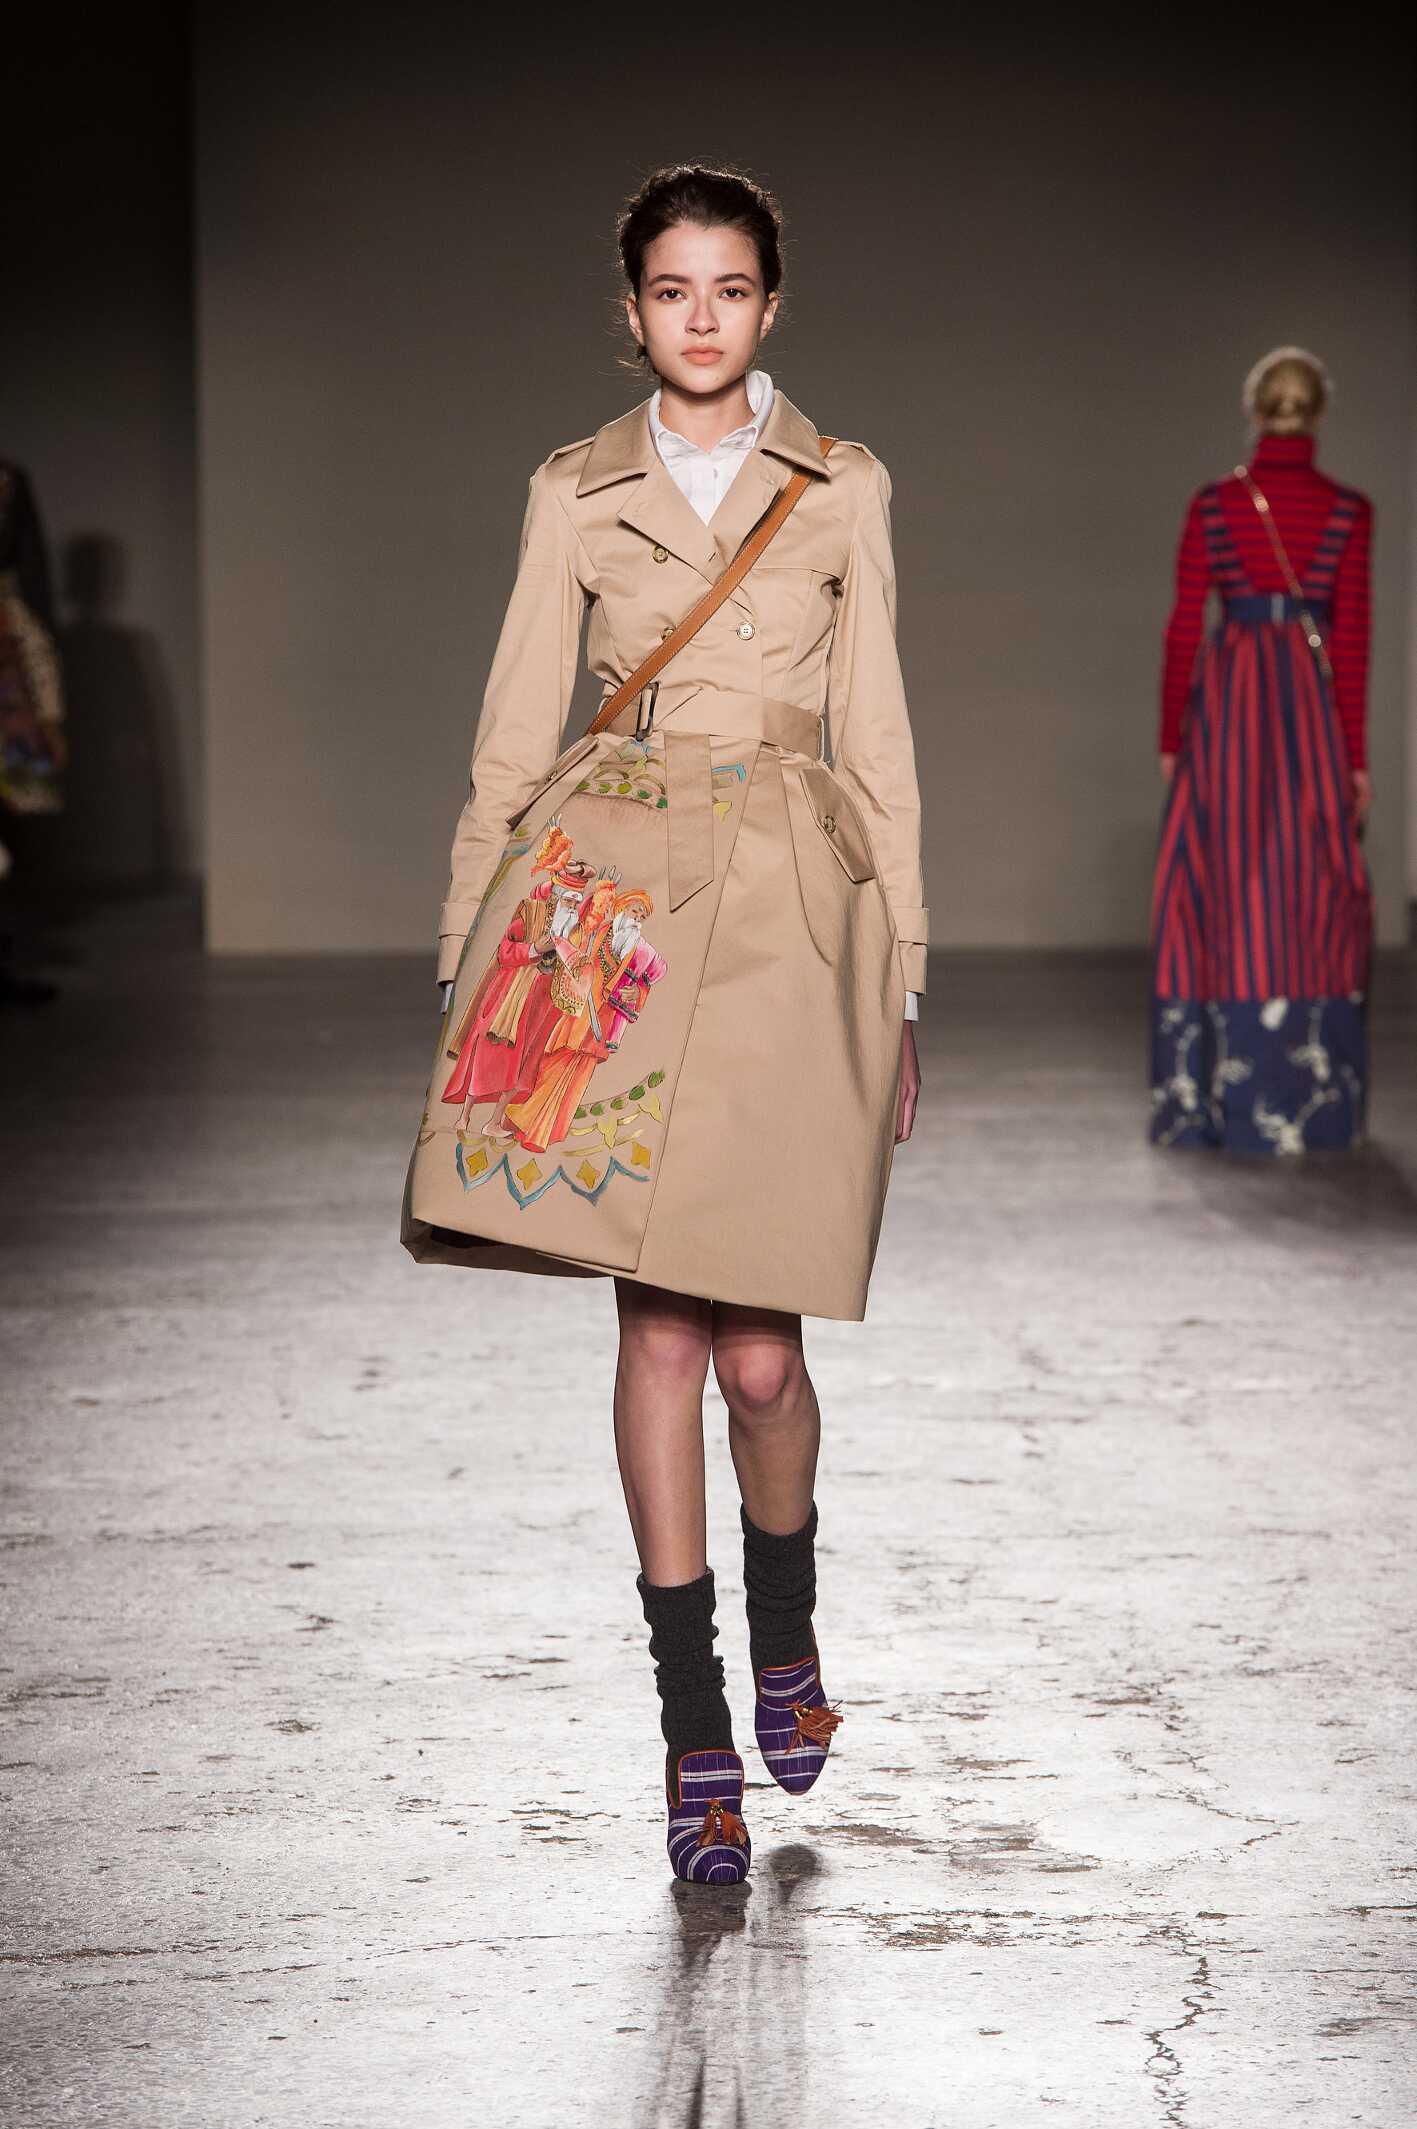 Stella Jean Collection Fall 2015 Catwalk